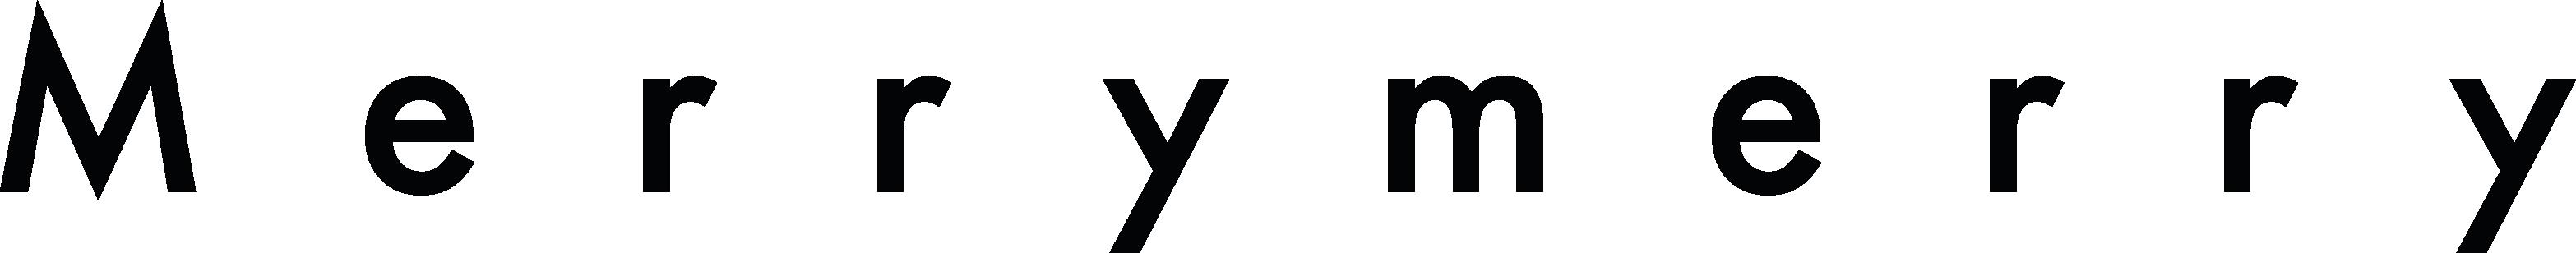 Merrymerry_logo_2020